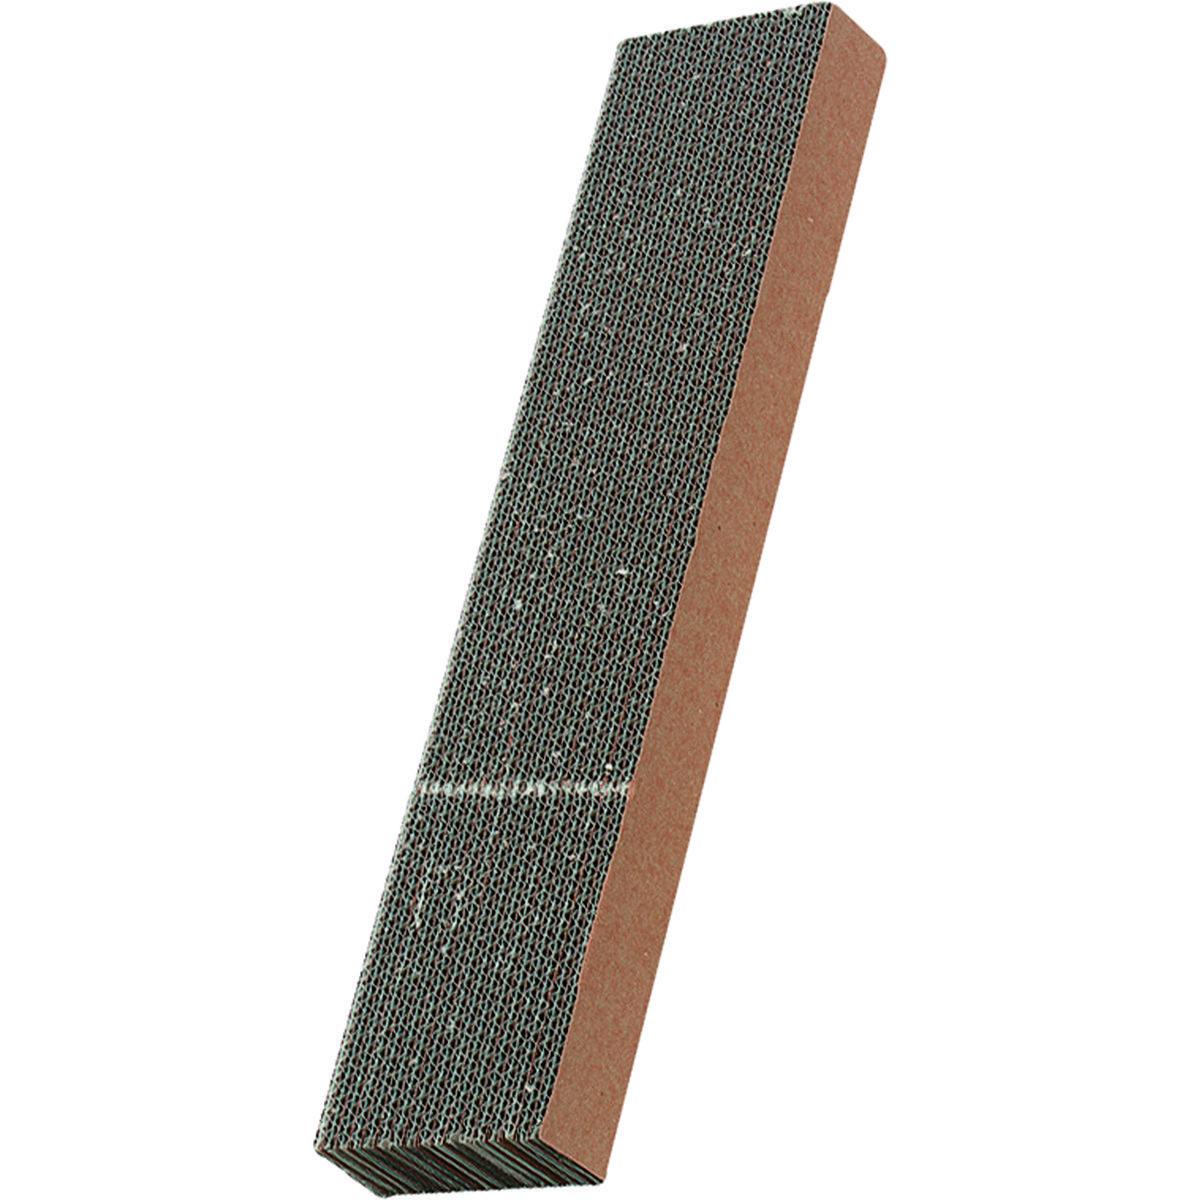 Krabplank-Karton-50-x-12-x-4.5-cm-Flamingo-Bruin